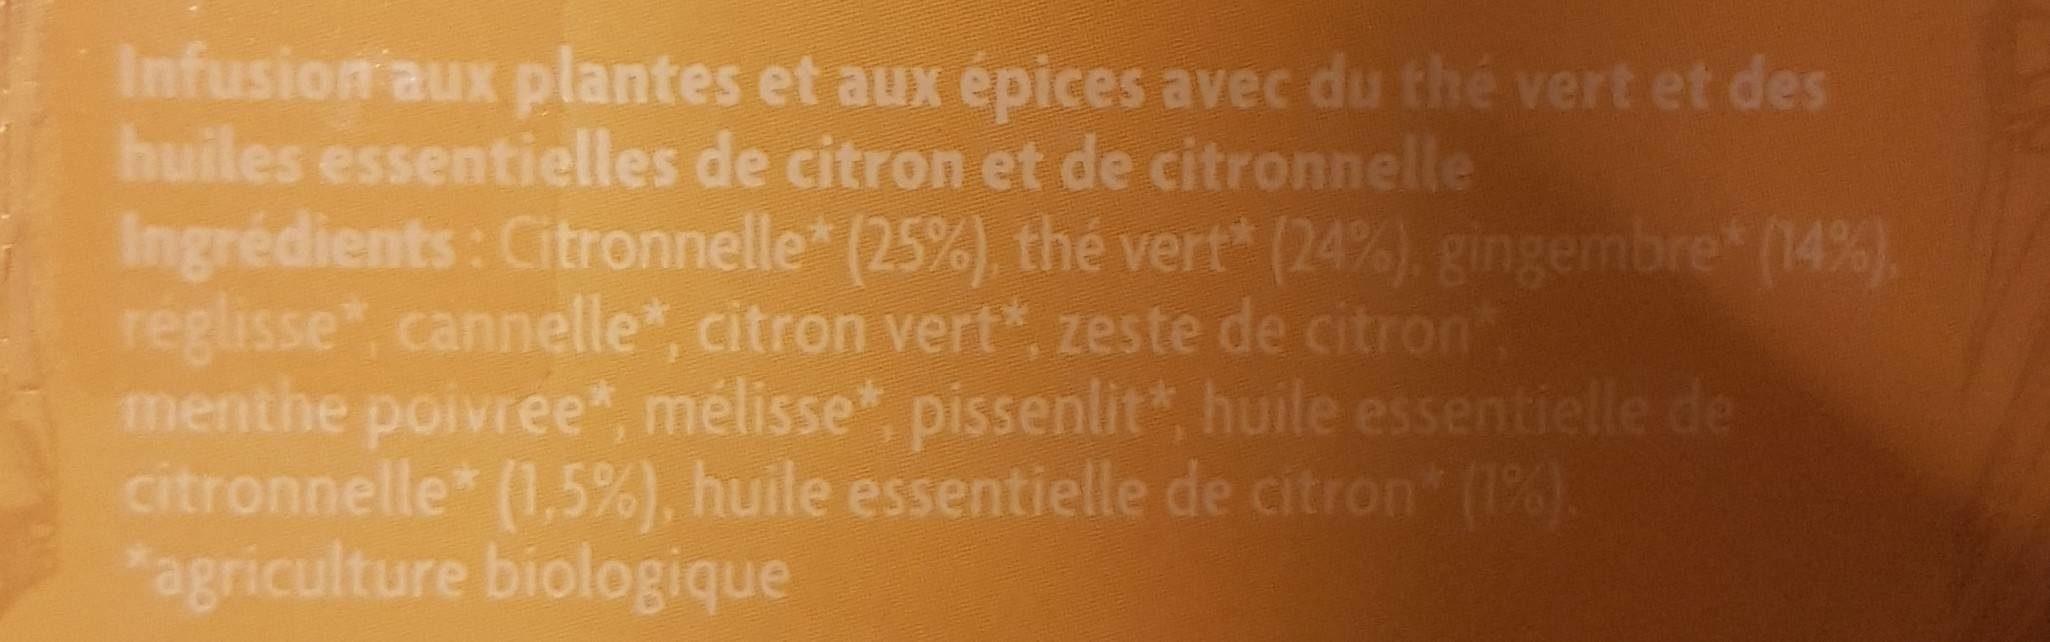 Pure hapiness thé - Ingrediënten - fr